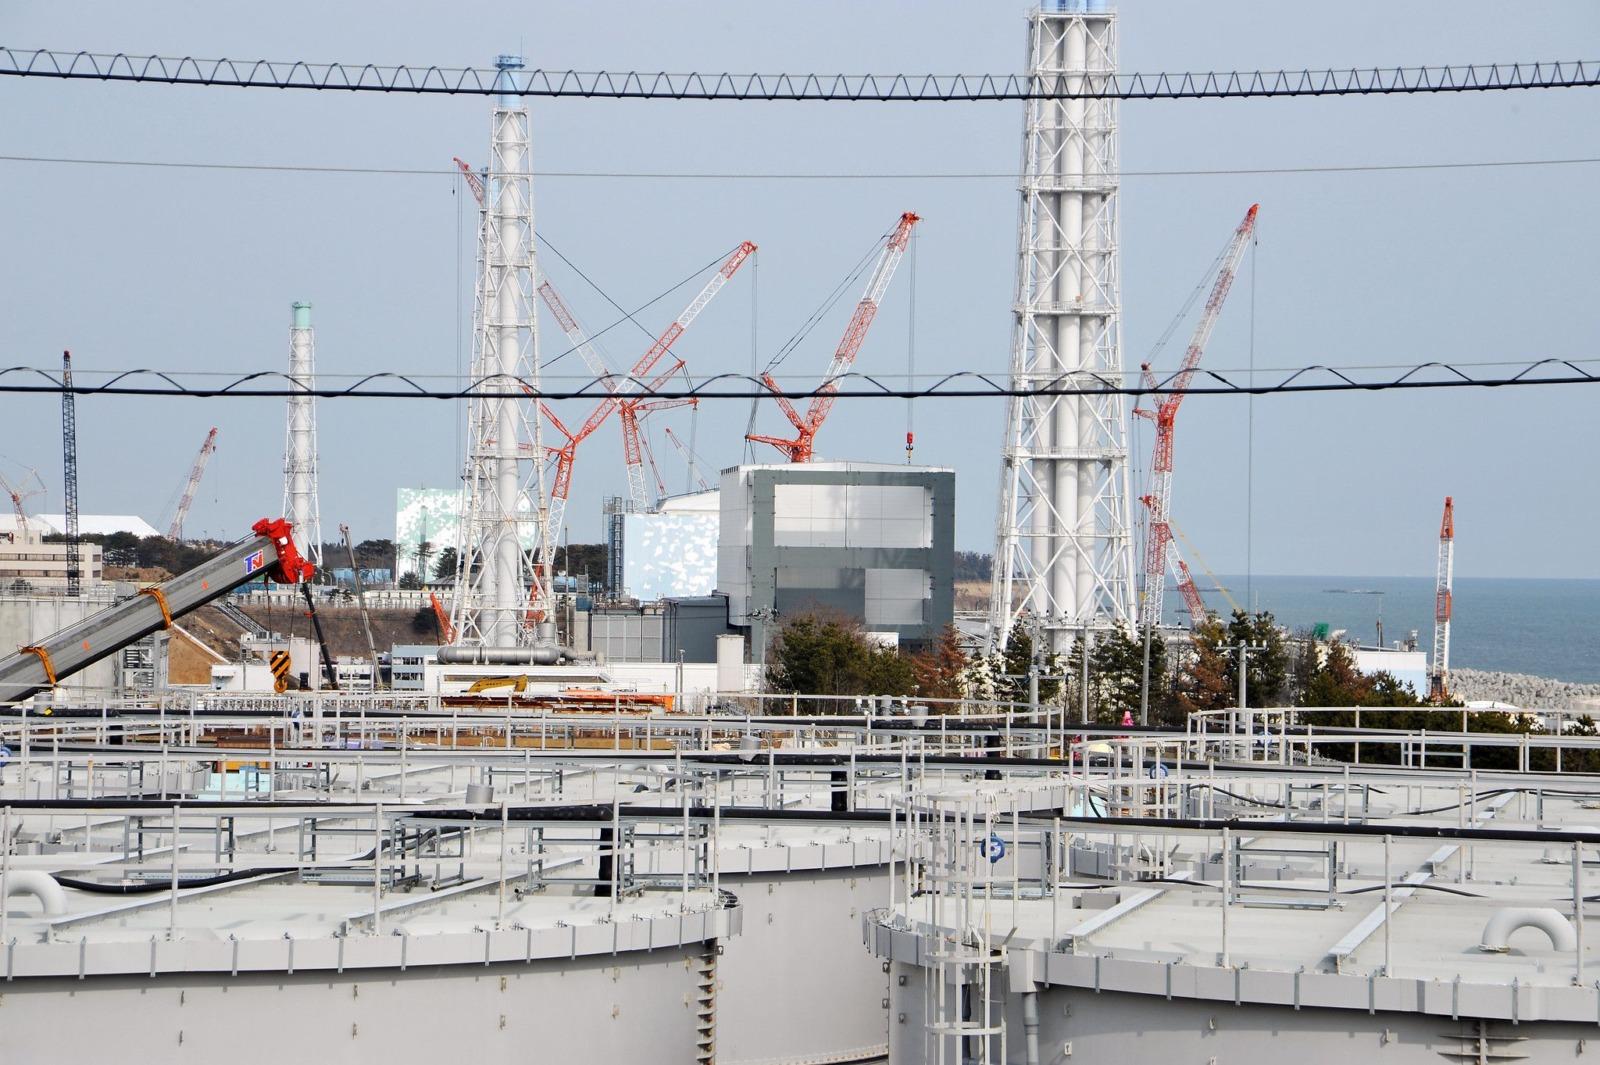 Wassertanks Fukushima IAEA Imagebank ccby20